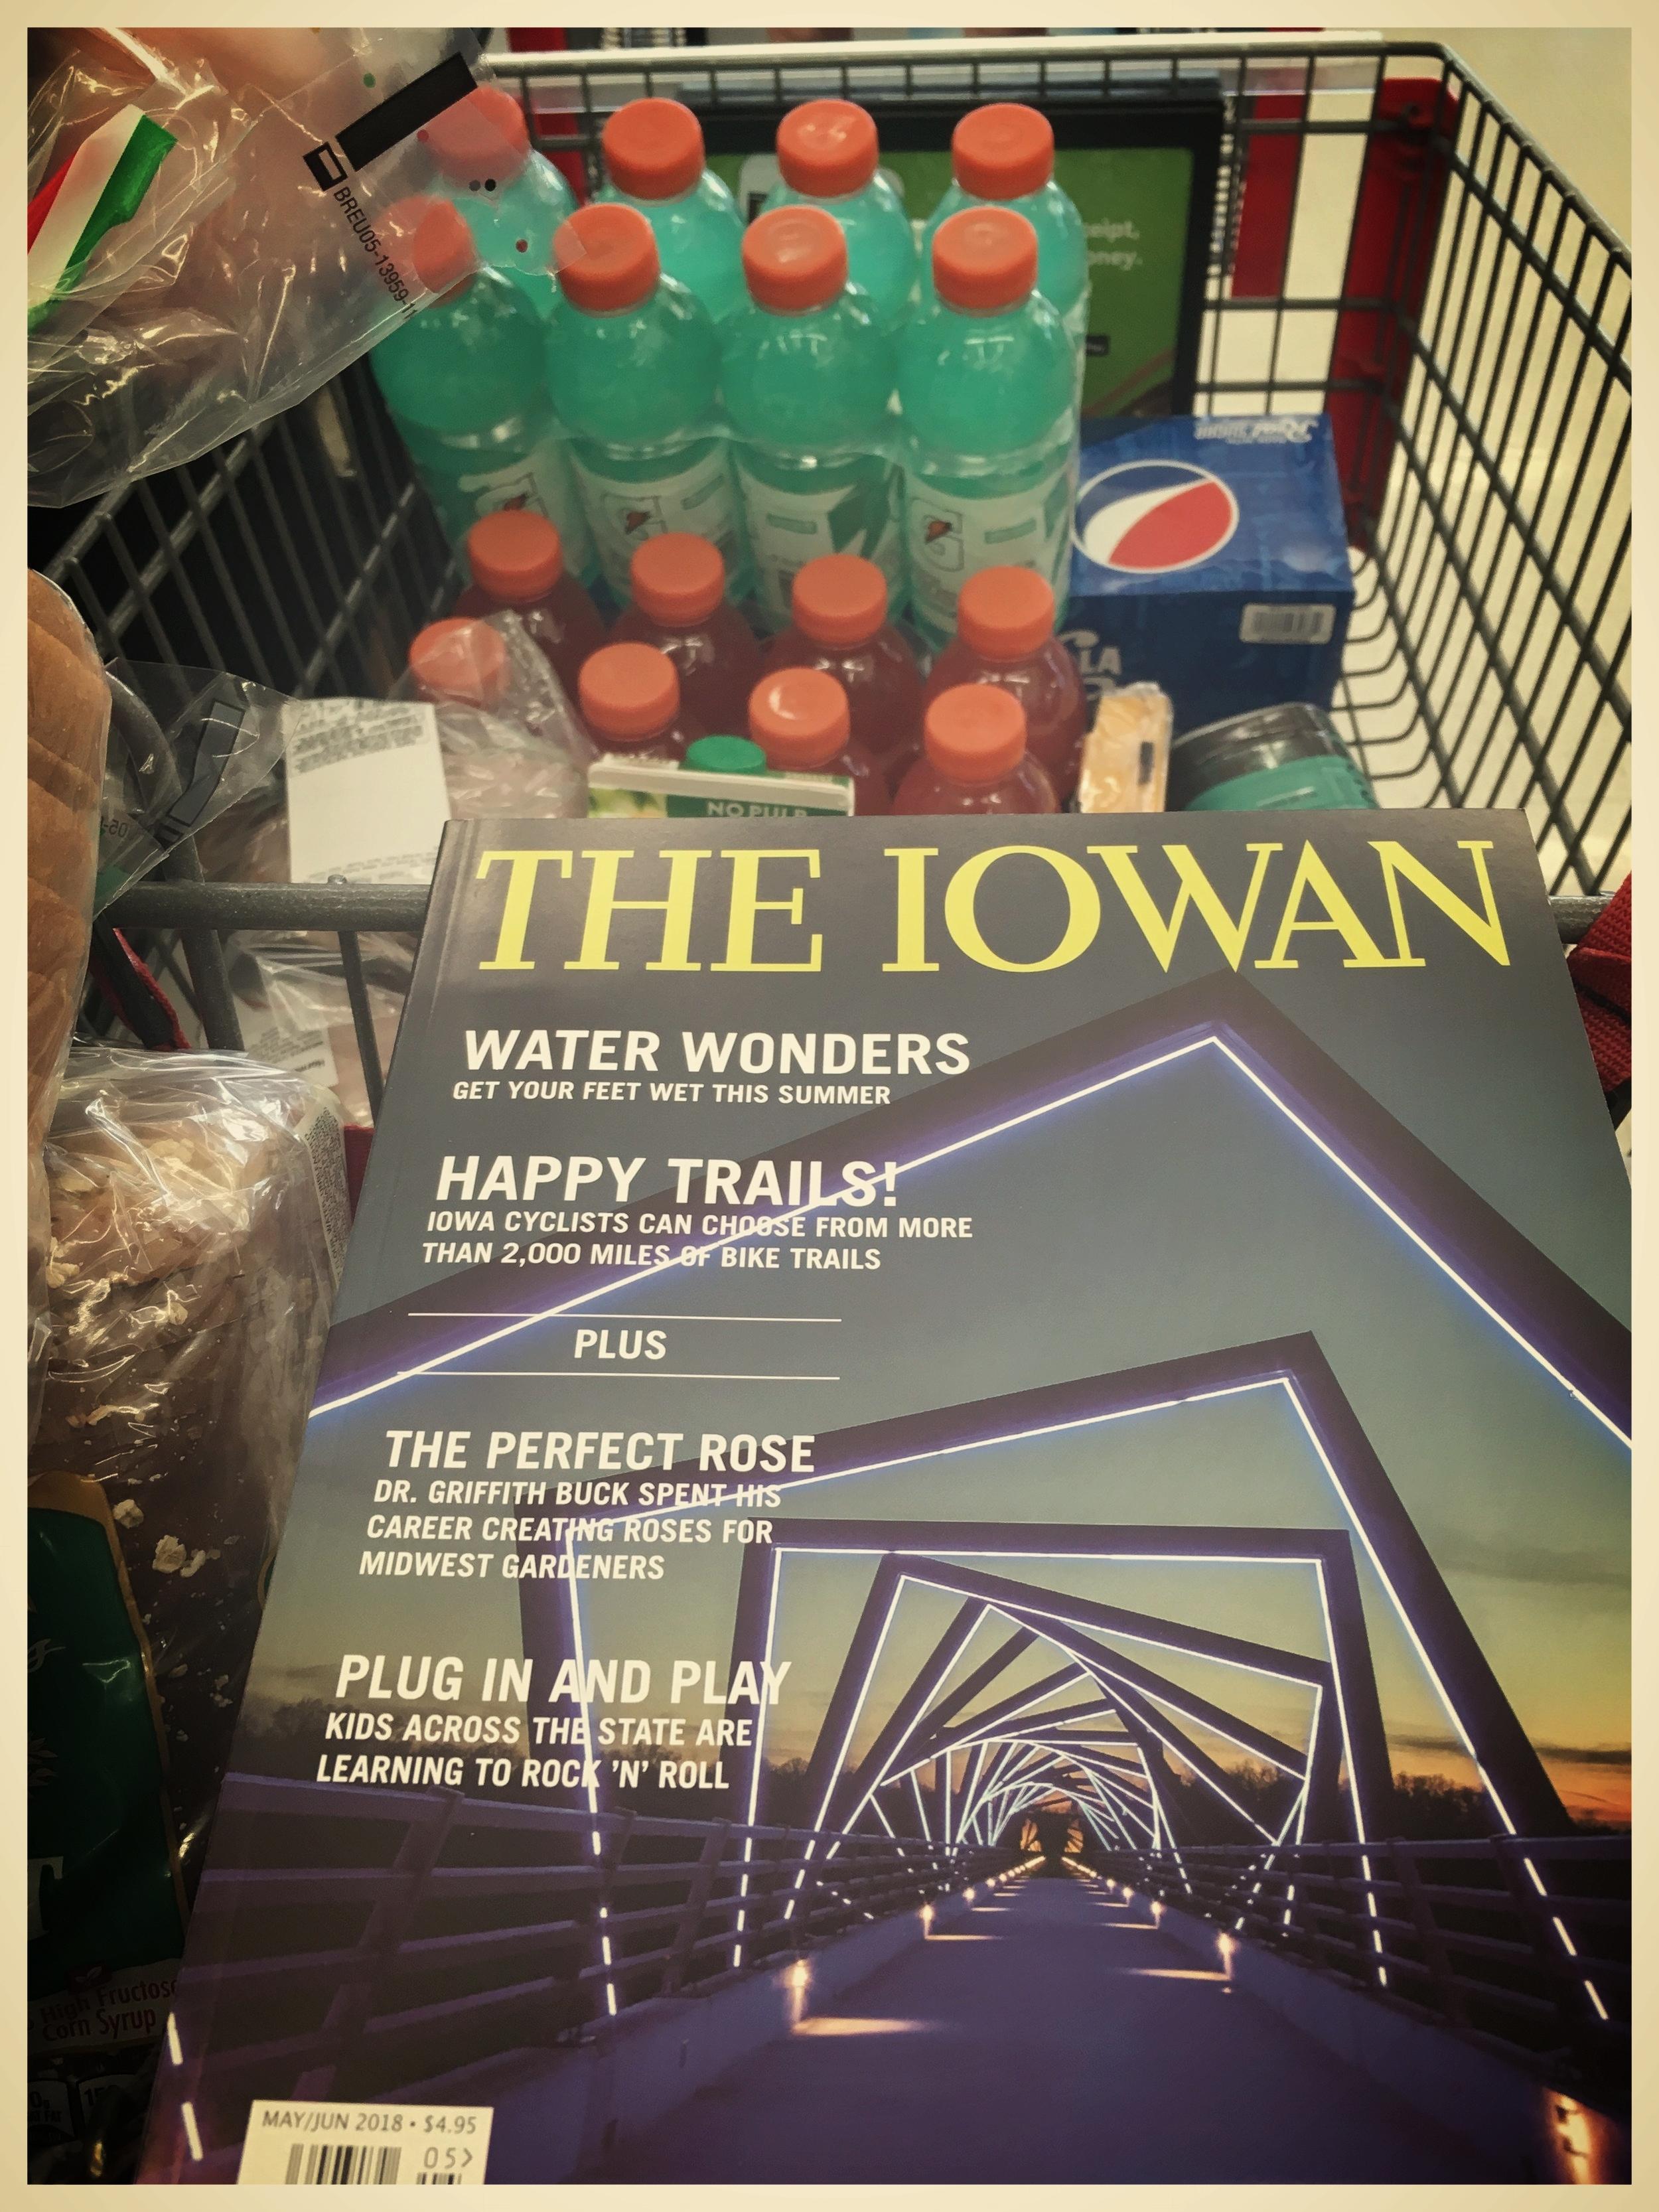 Iowa-Bike-Rides-The-Iowan-Magazine